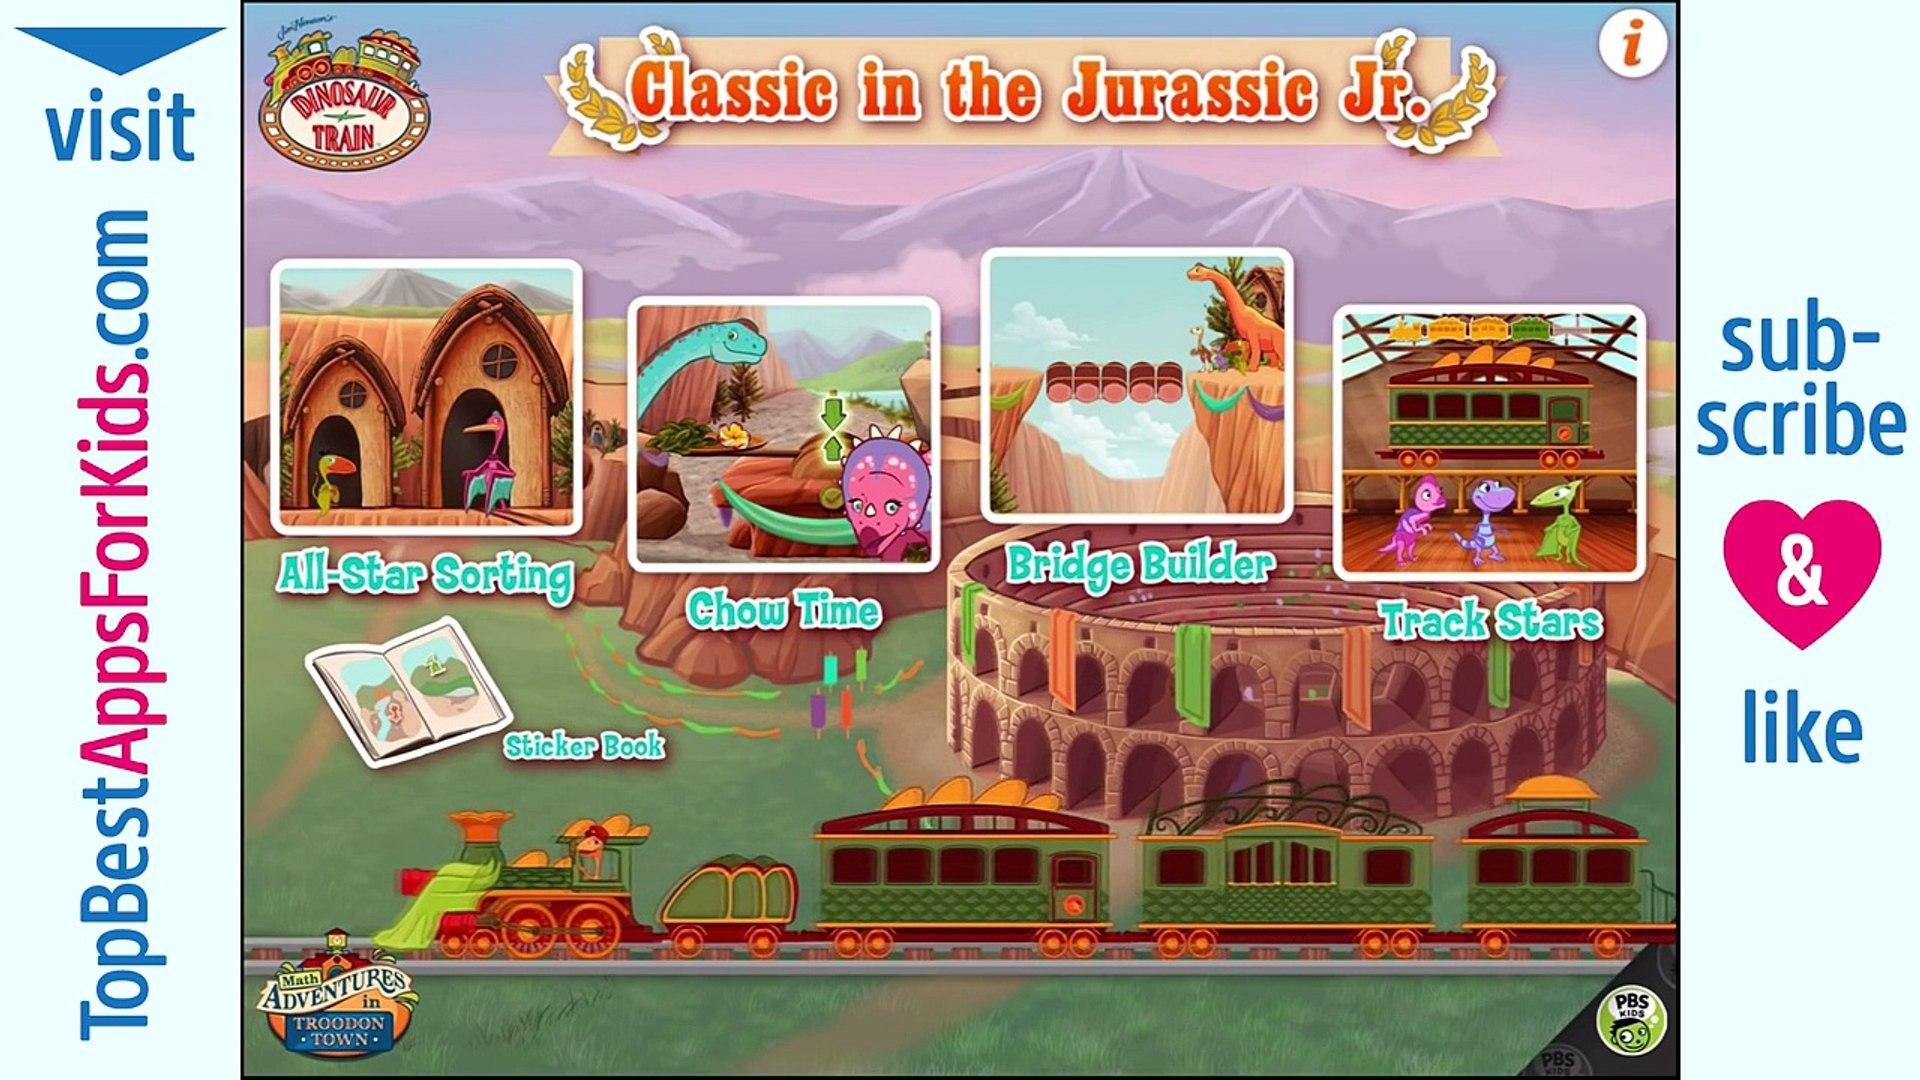 Dinosaur Train: Classic in the Jurassic Jr. - Education Games for Kids